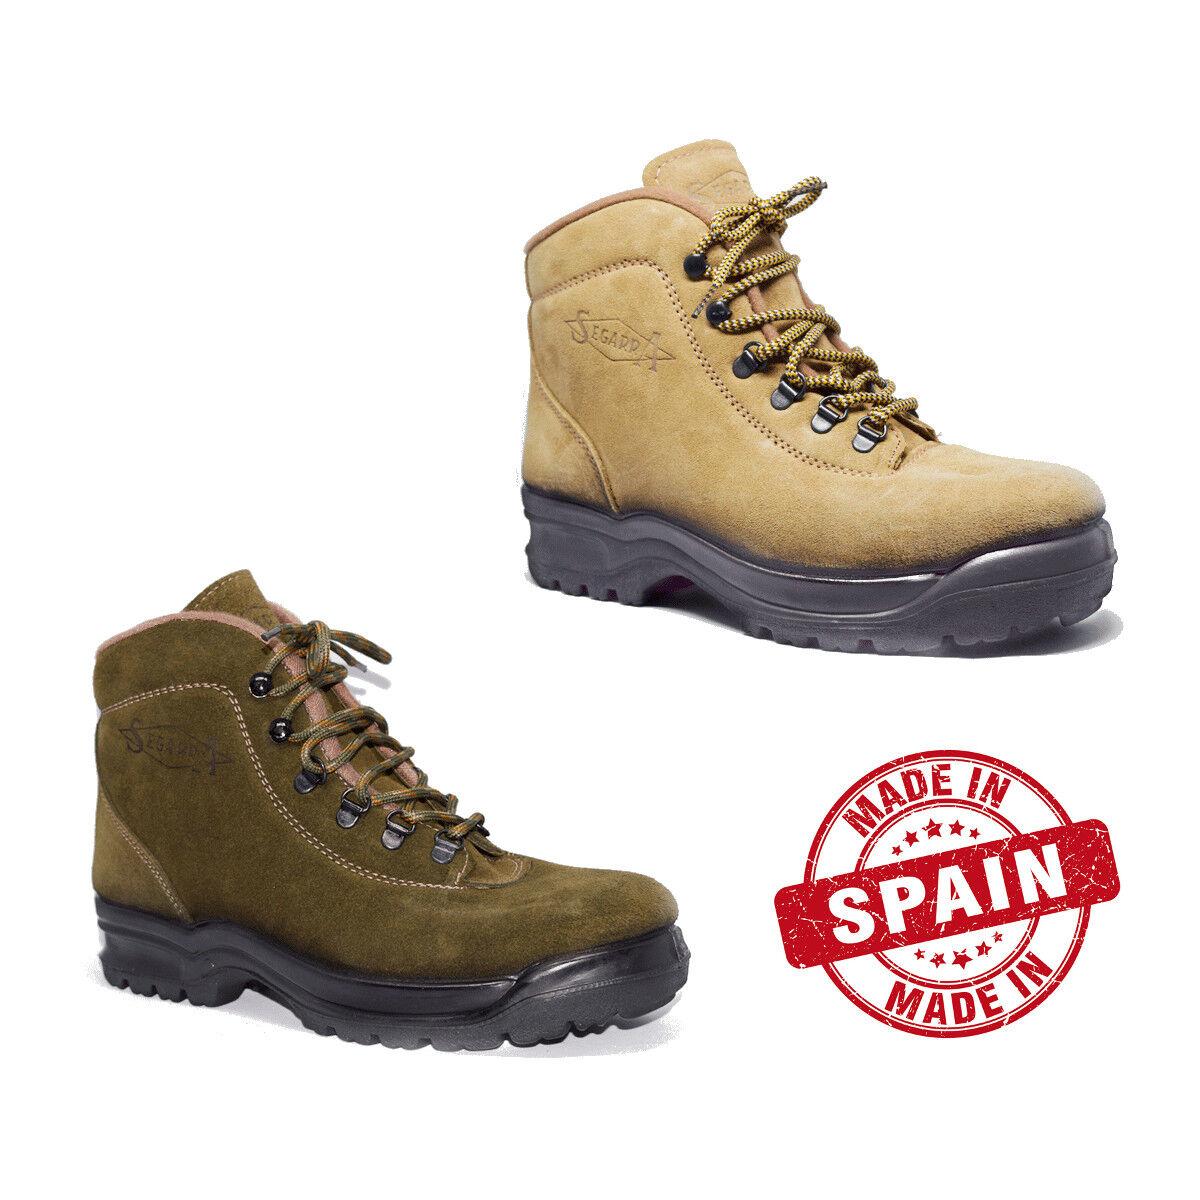 Boots Trekking Mountain Hiking size 36 37 38 39 40 41 42 43 44 45 46 47 48